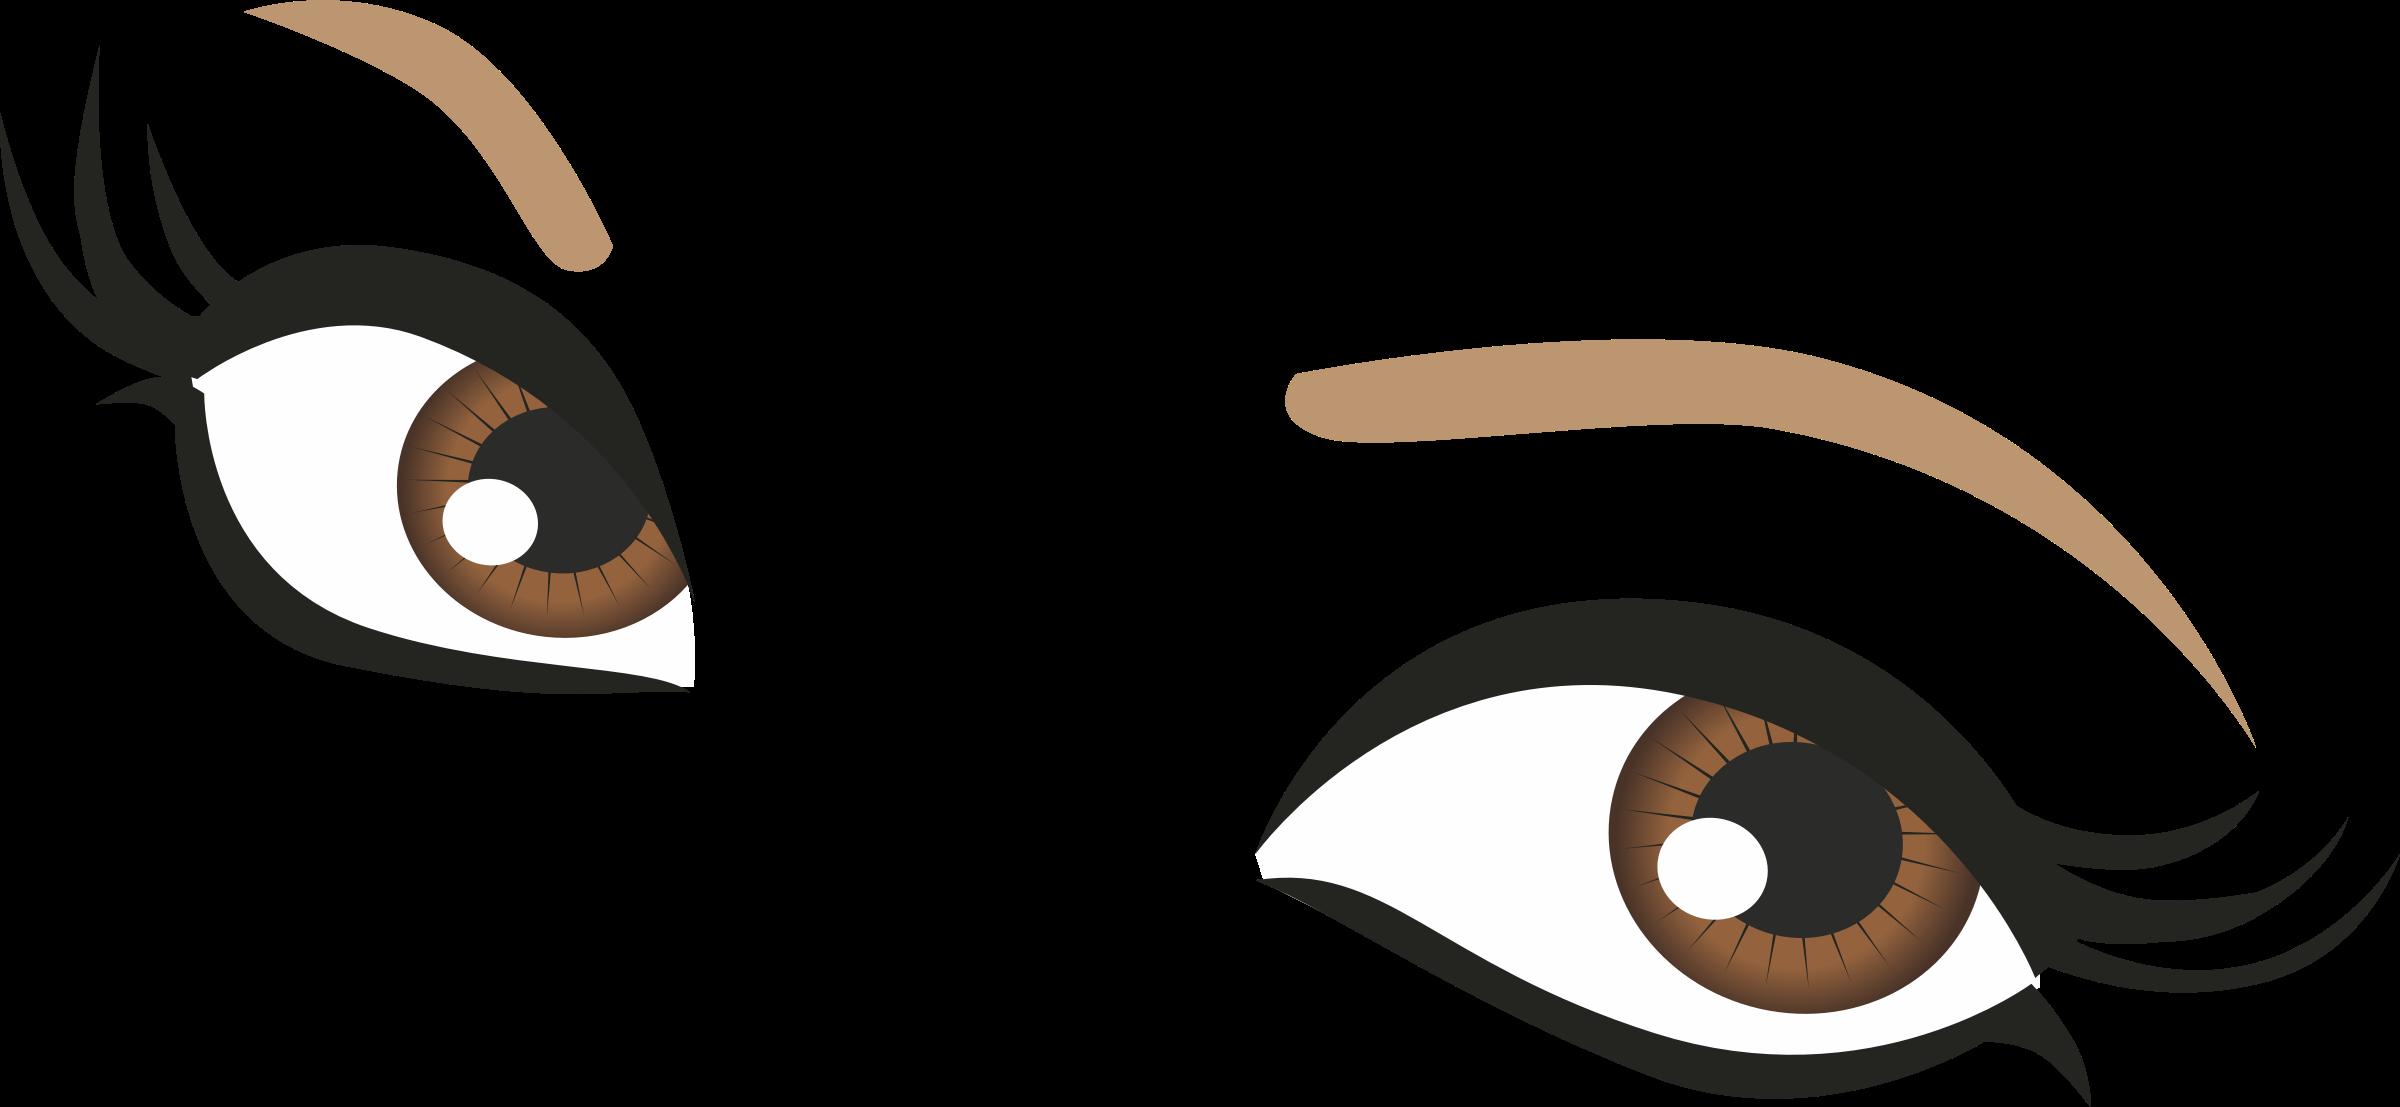 Eyes big image png. Eyeballs clipart 3 eye